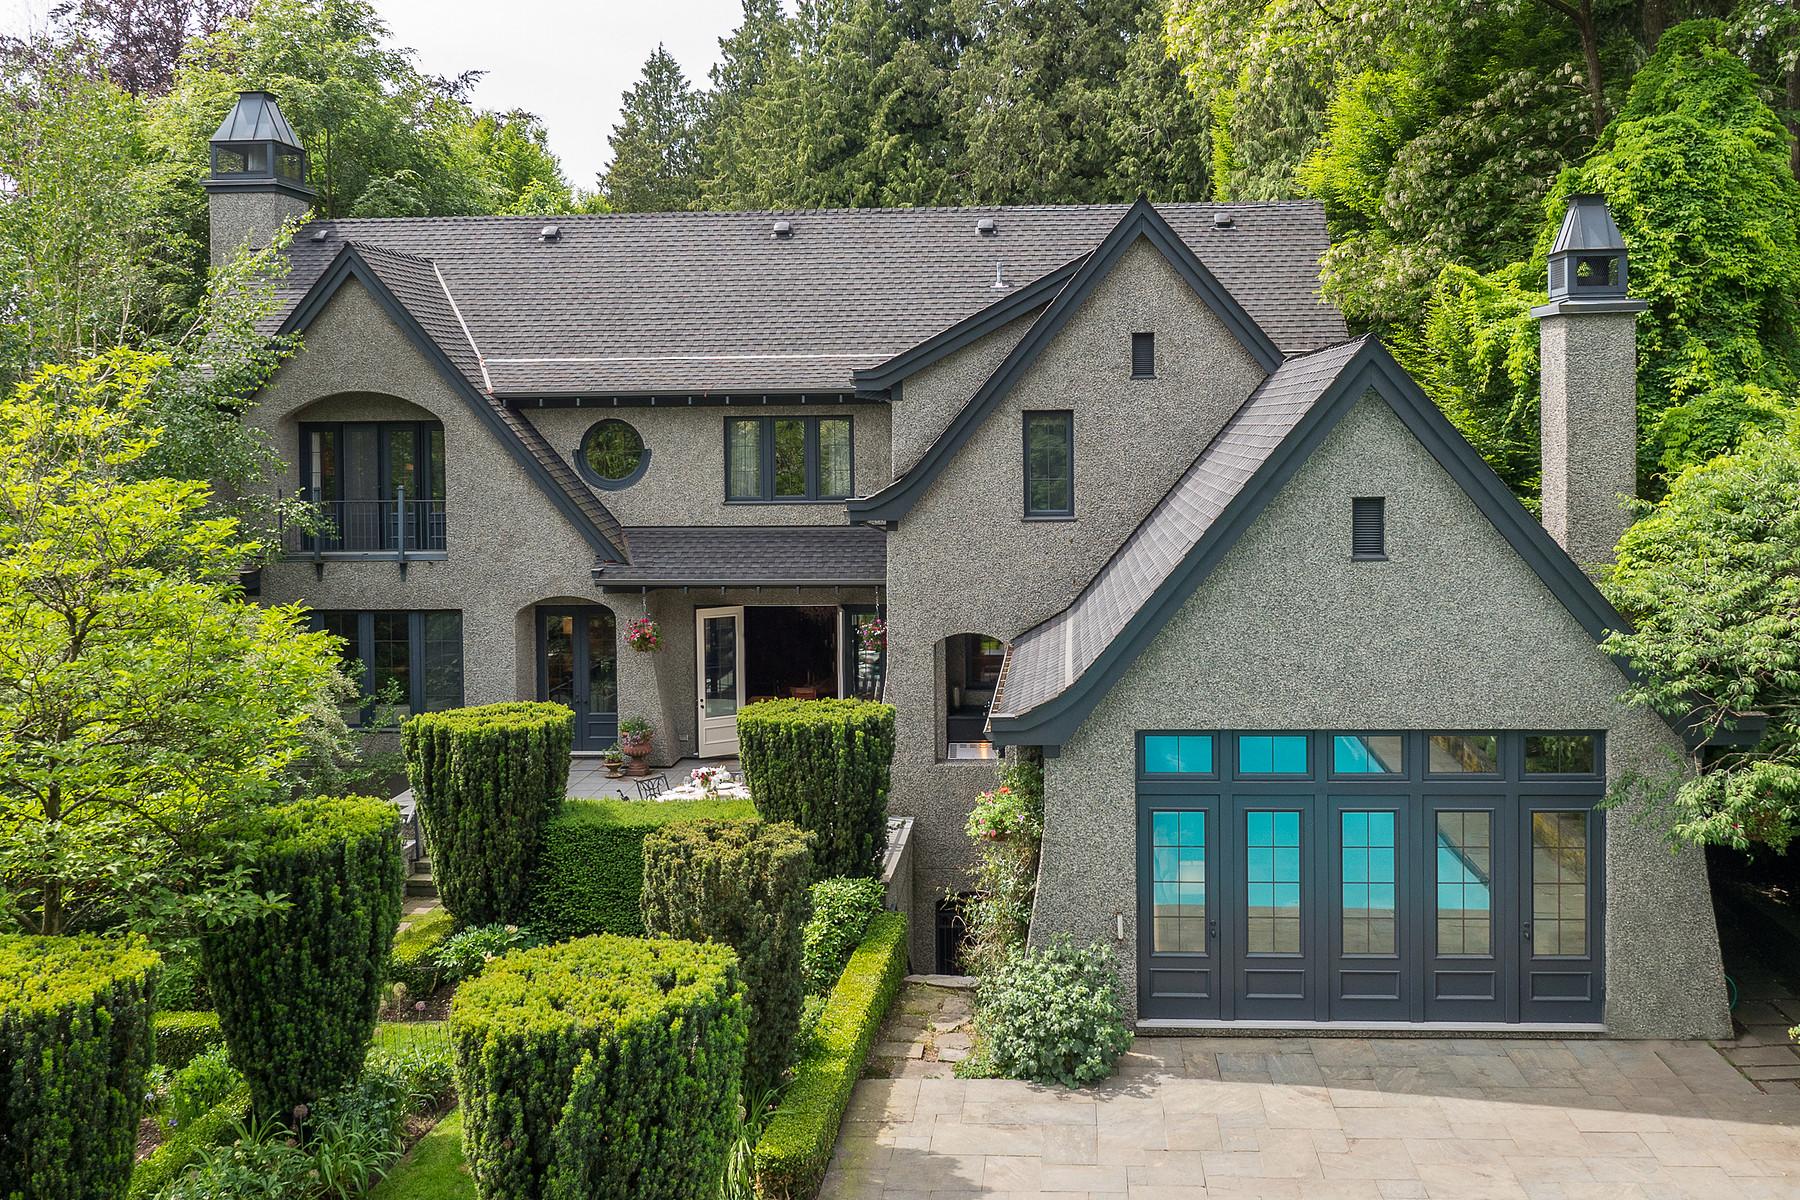 獨棟家庭住宅 為 出售 在 Vancouver West, Greater Vancouver 6188 Macdonald Street Vancouver, 不列顛哥倫比亞省, V6N 1E9 加拿大